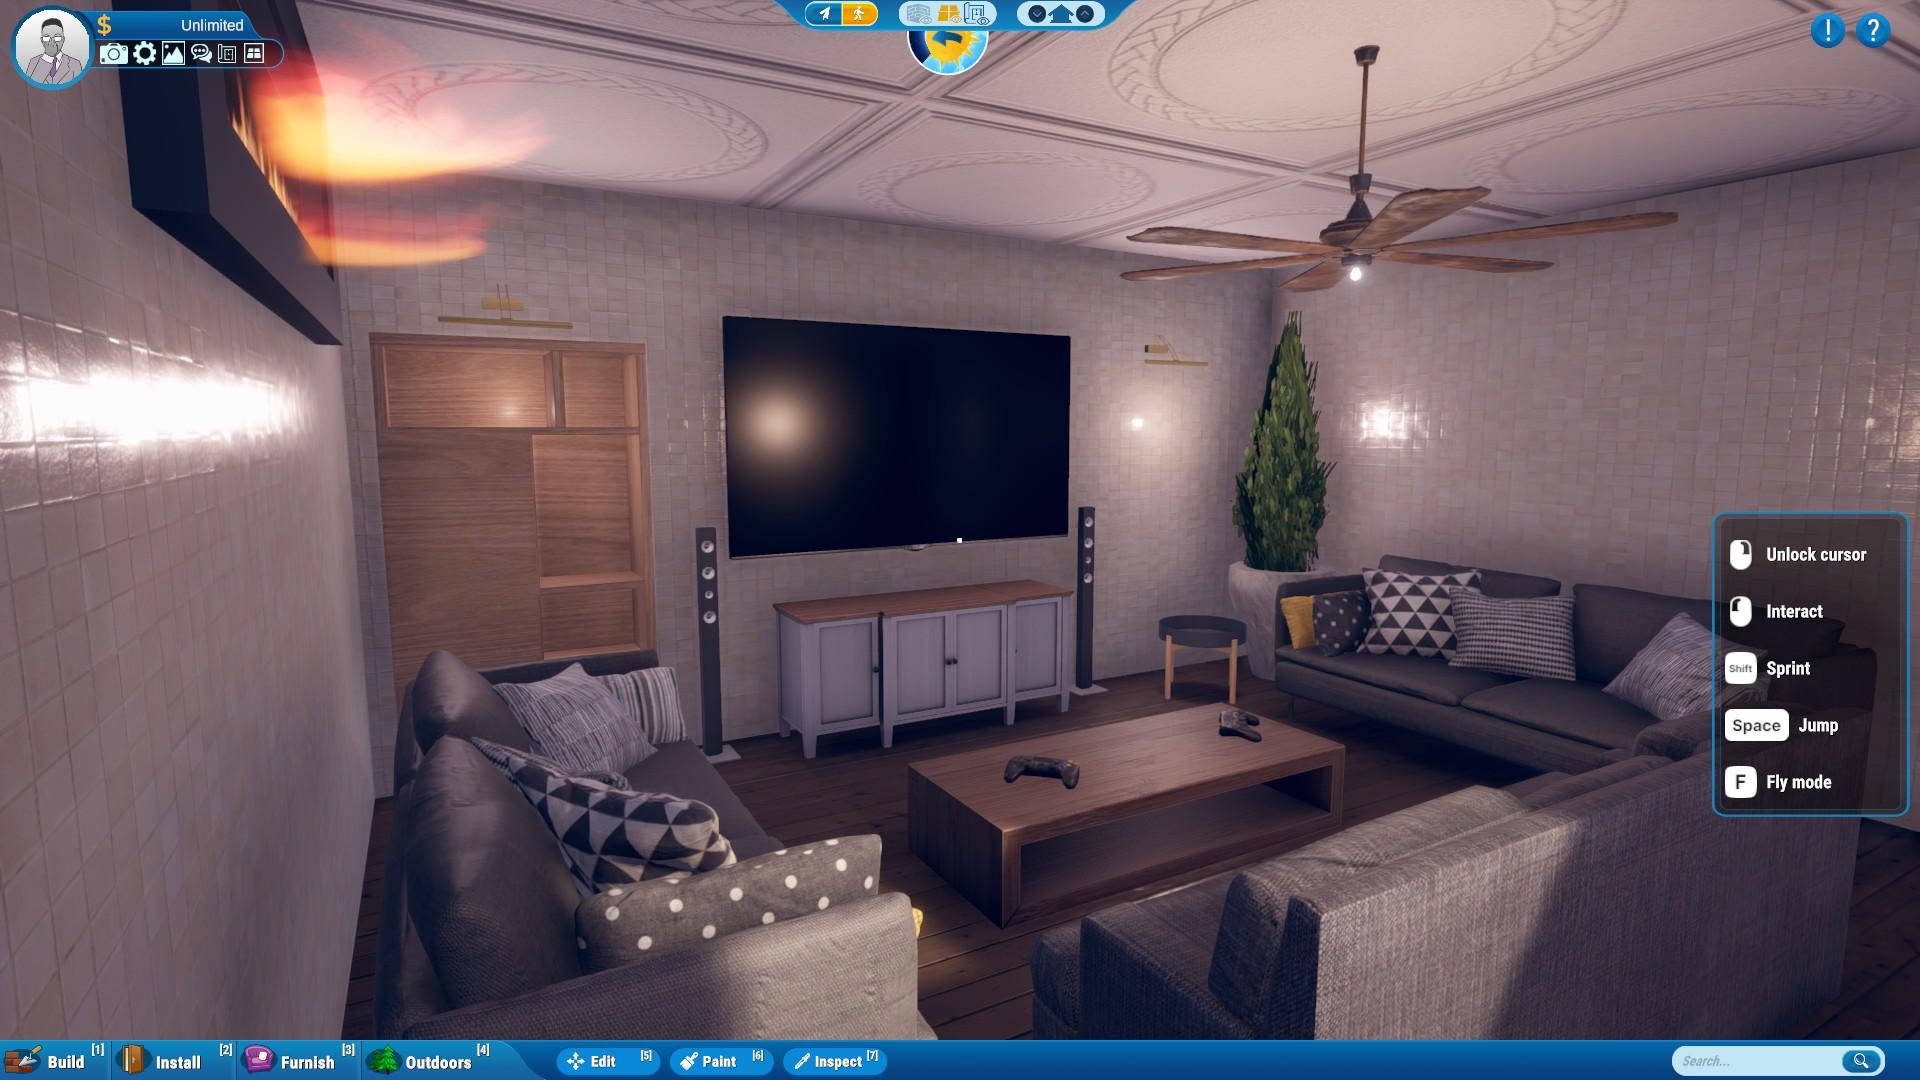 Hometopia Steam Next Fest Simulator Demo Living Room